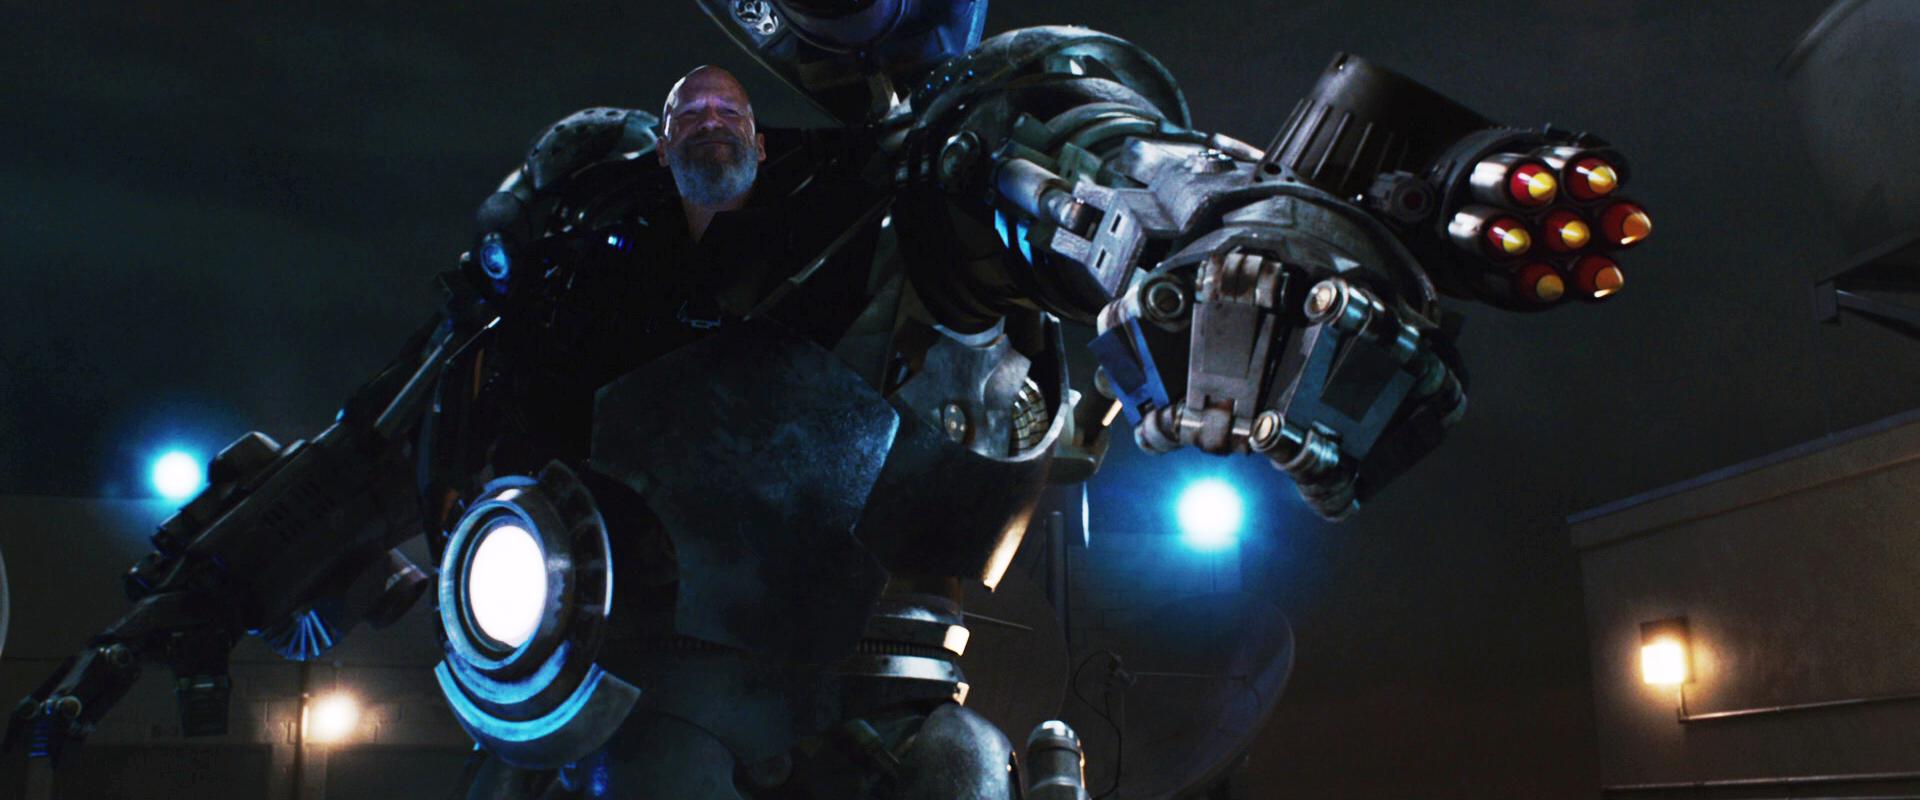 [Hot Toys] Avengers: Age of Ultron - Hulkbuster - Página 12 Latest?cb=20140122041347